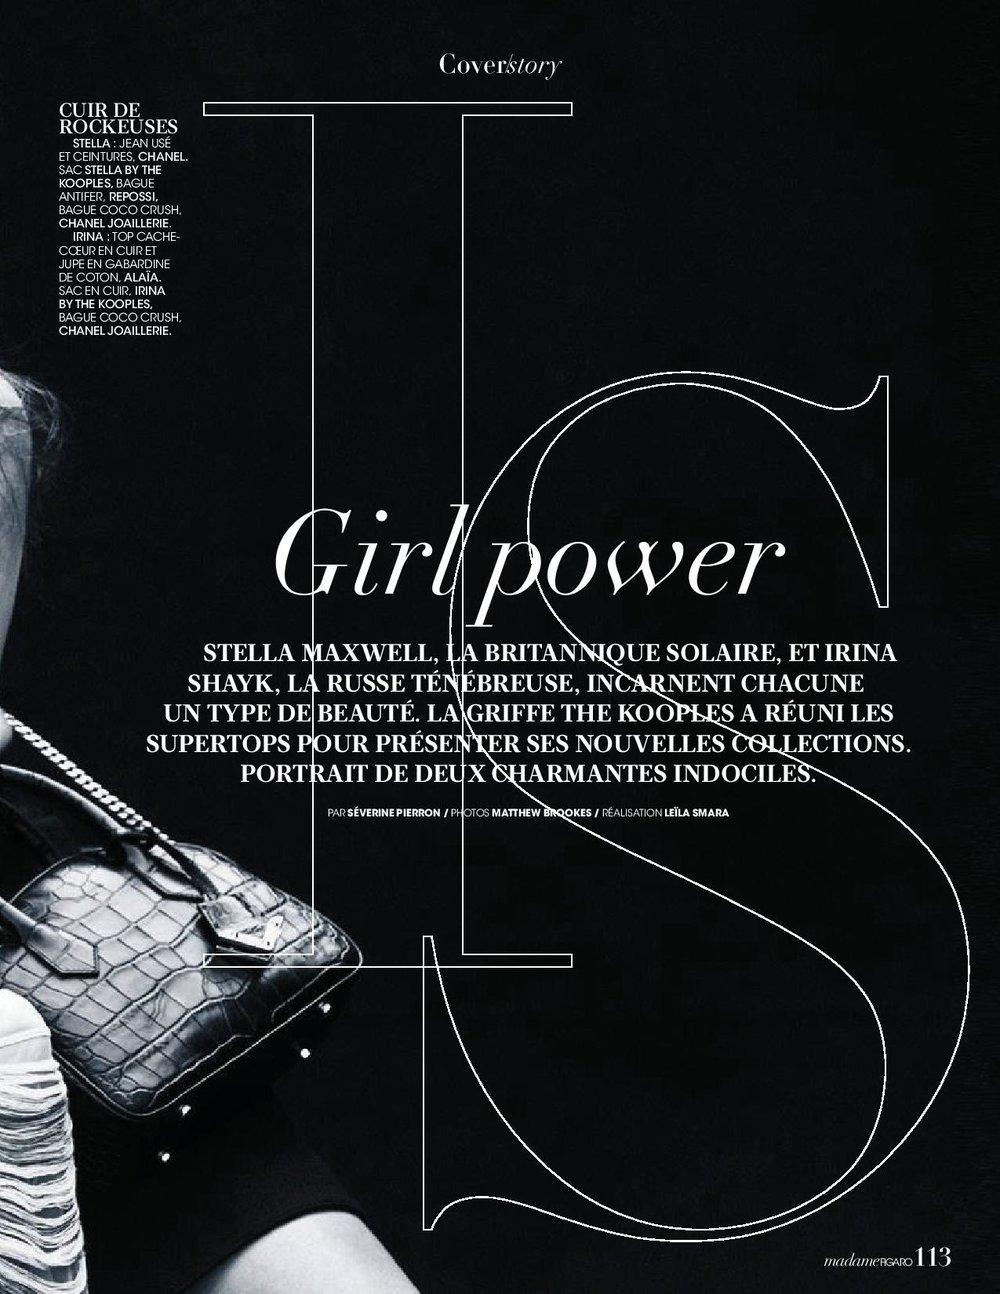 Irina Shayk + Stella Maxwell by Matthew Brookes for Madame Figaro Nov 2018 (7).jpg